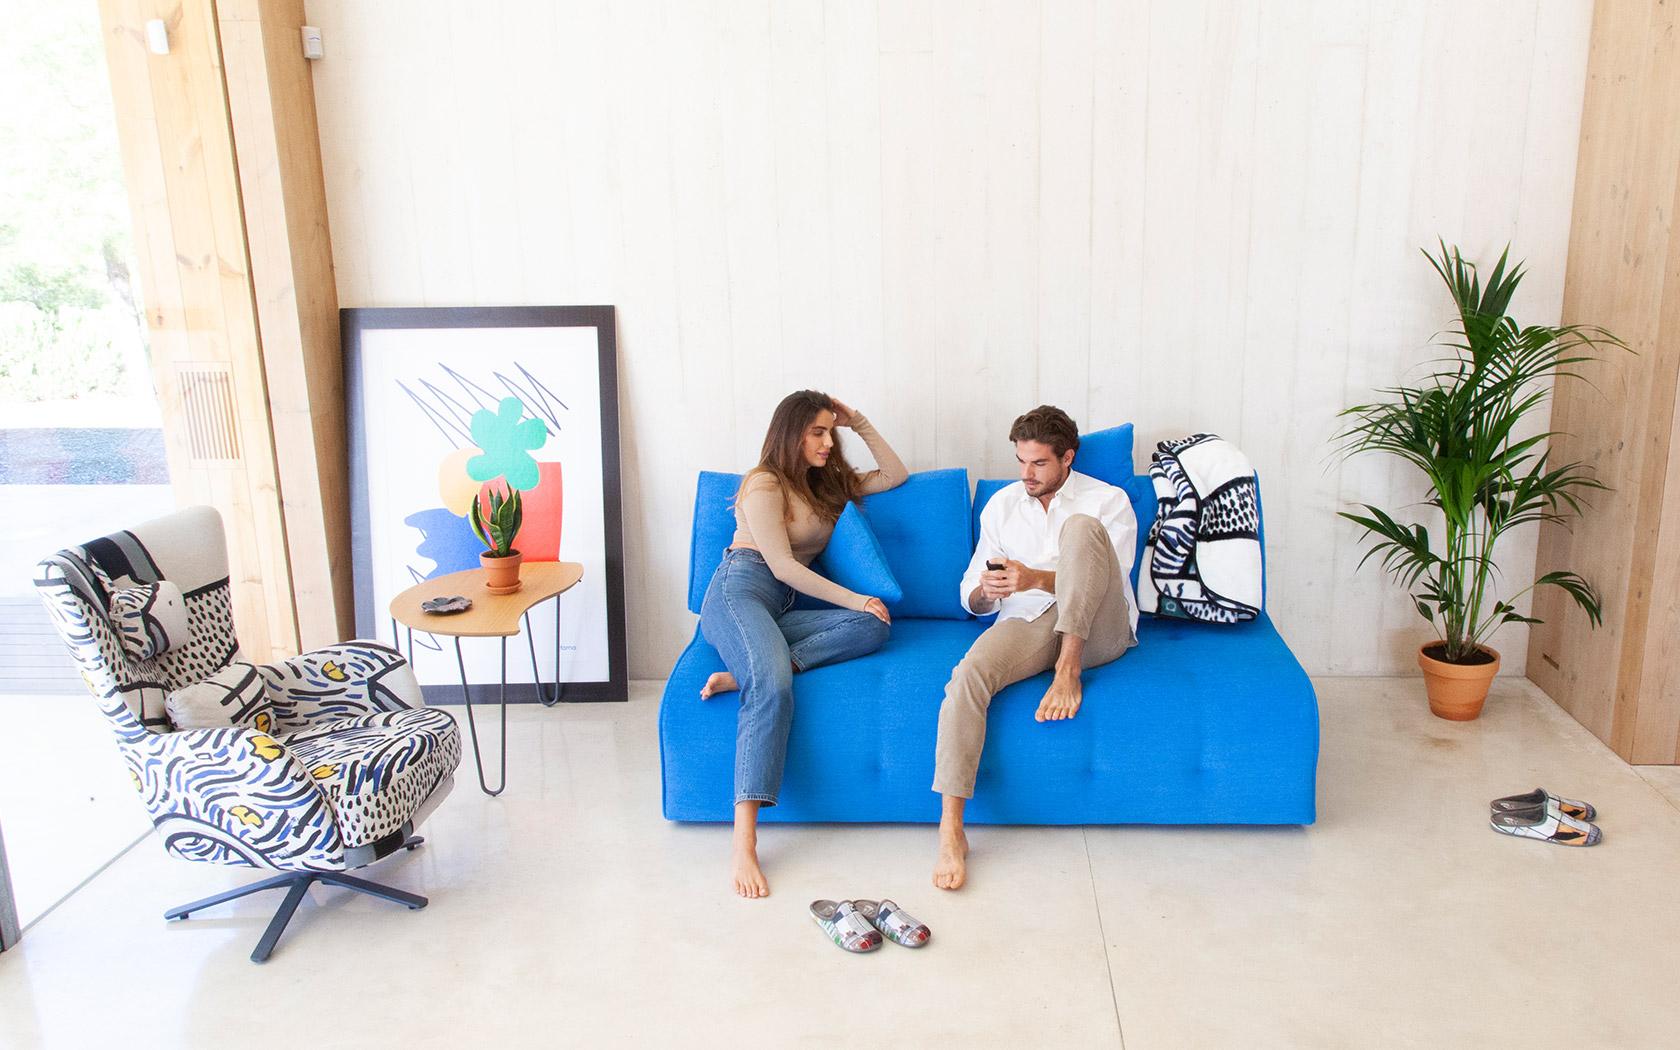 indy sofa 2021 baja 02